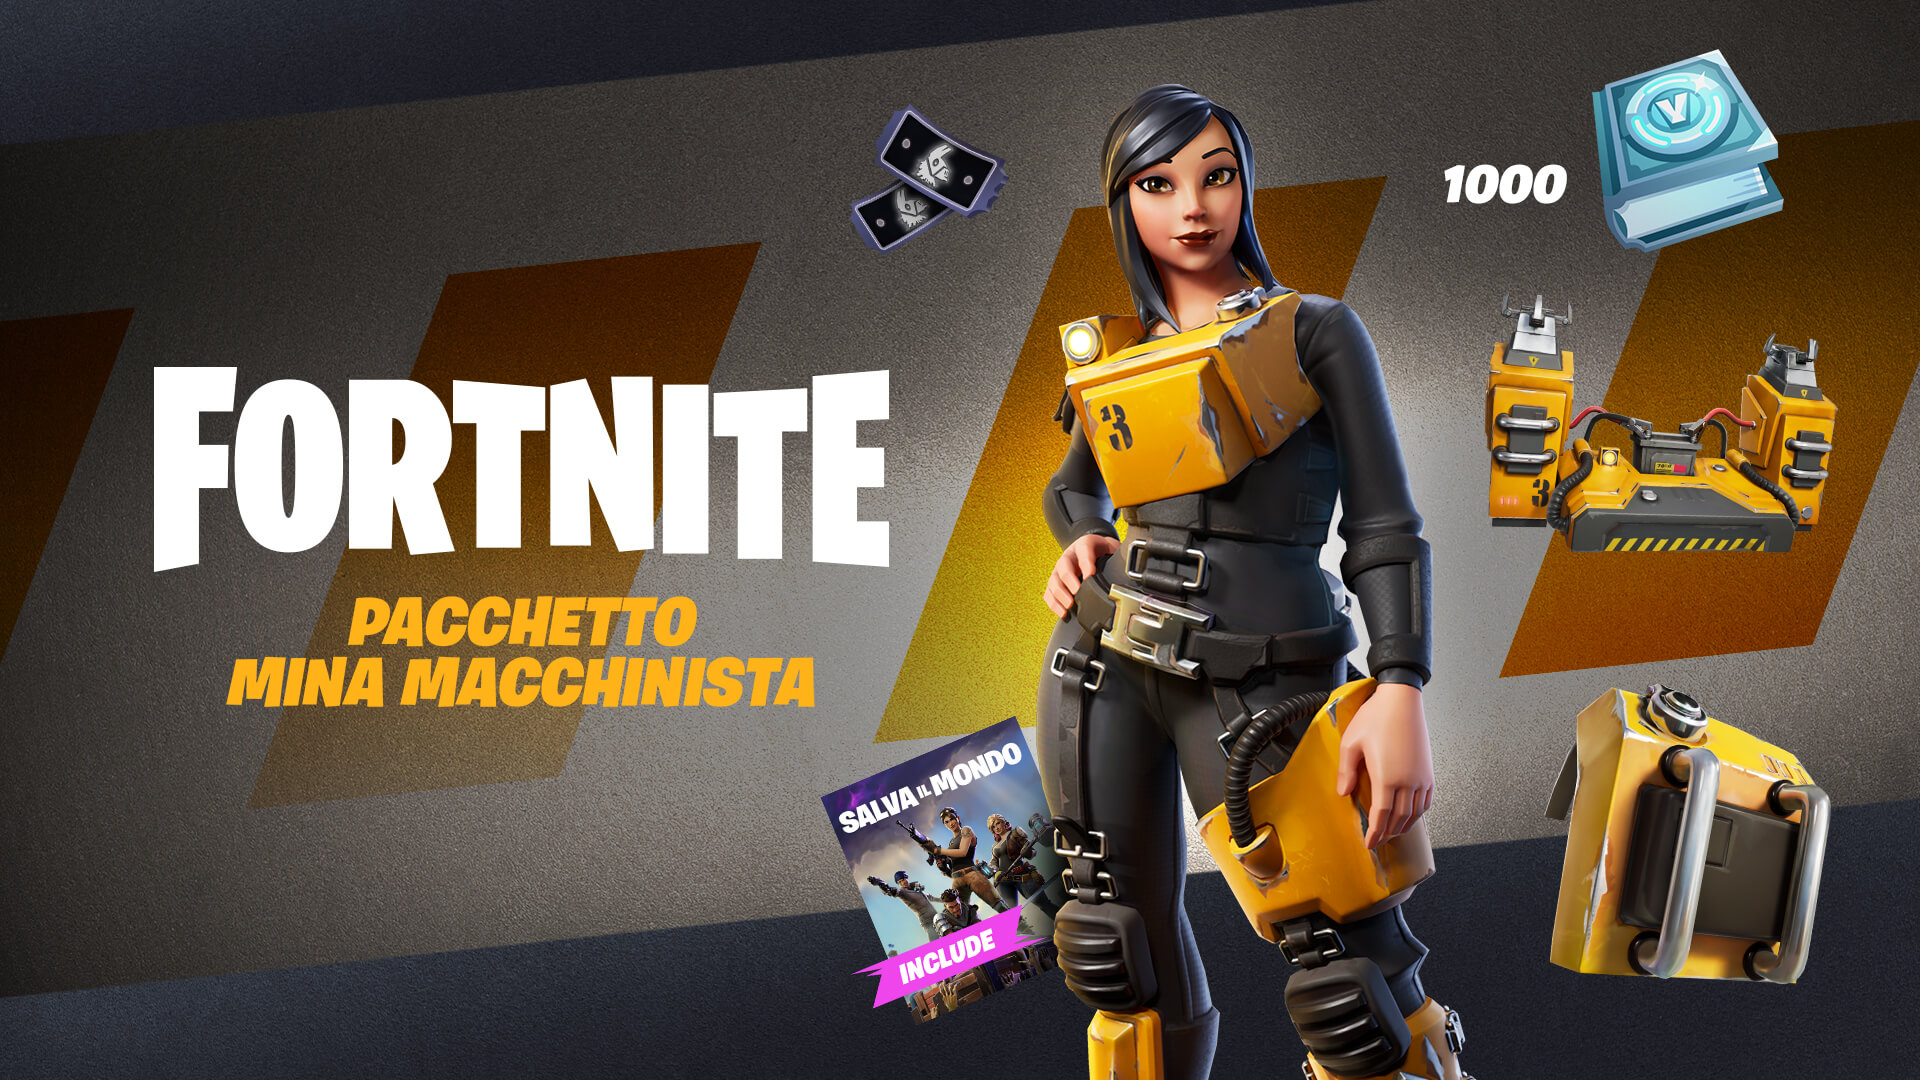 Fortnite Save The World Machinist Mina Pack IT